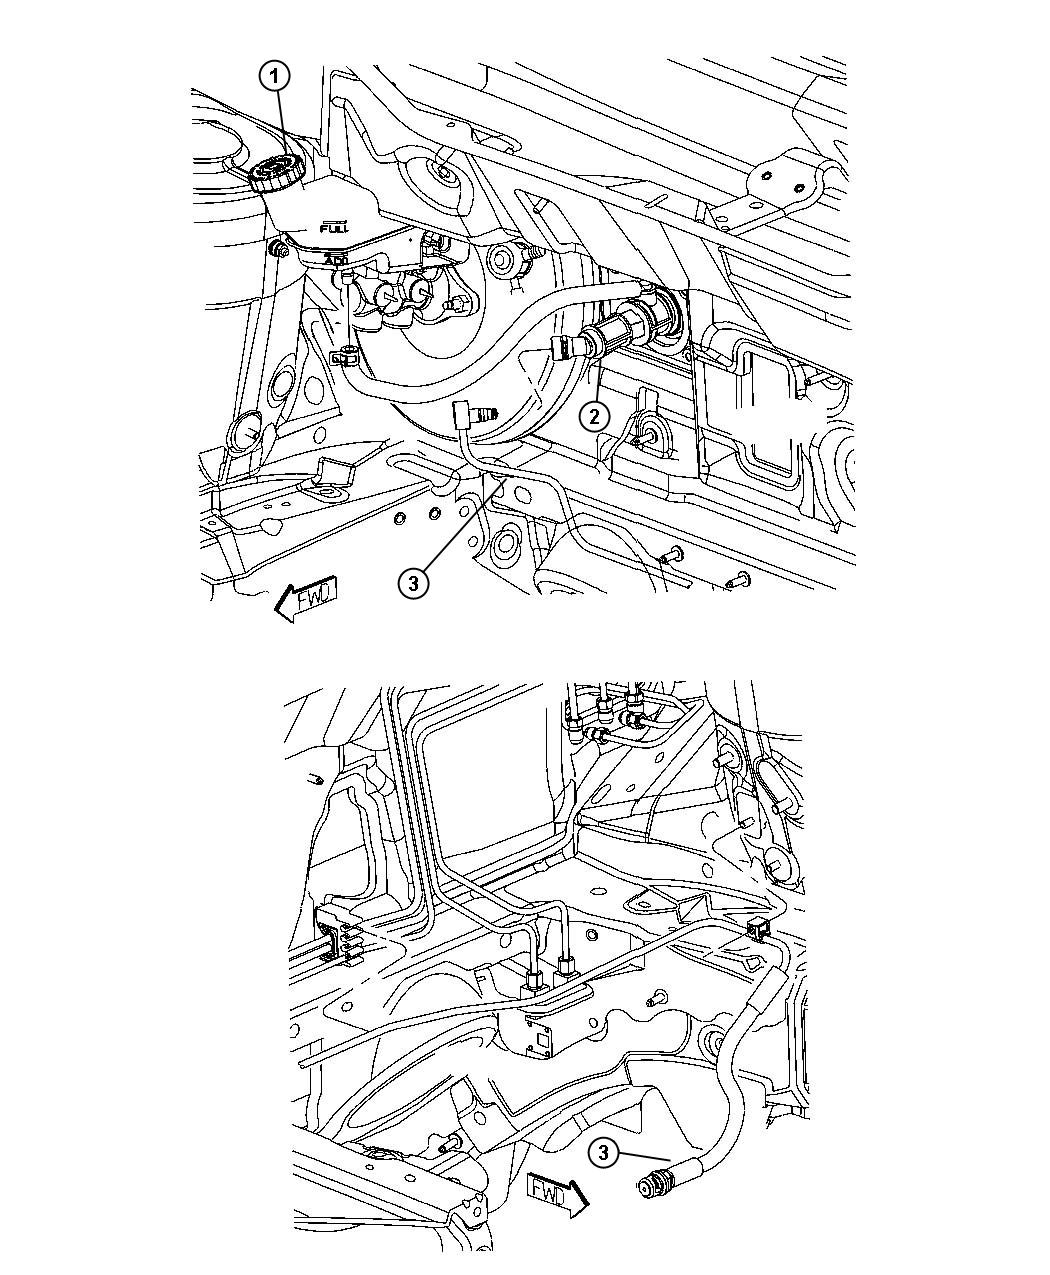 Dodge Caliber Plug. Body. Clutch actuator hole cover